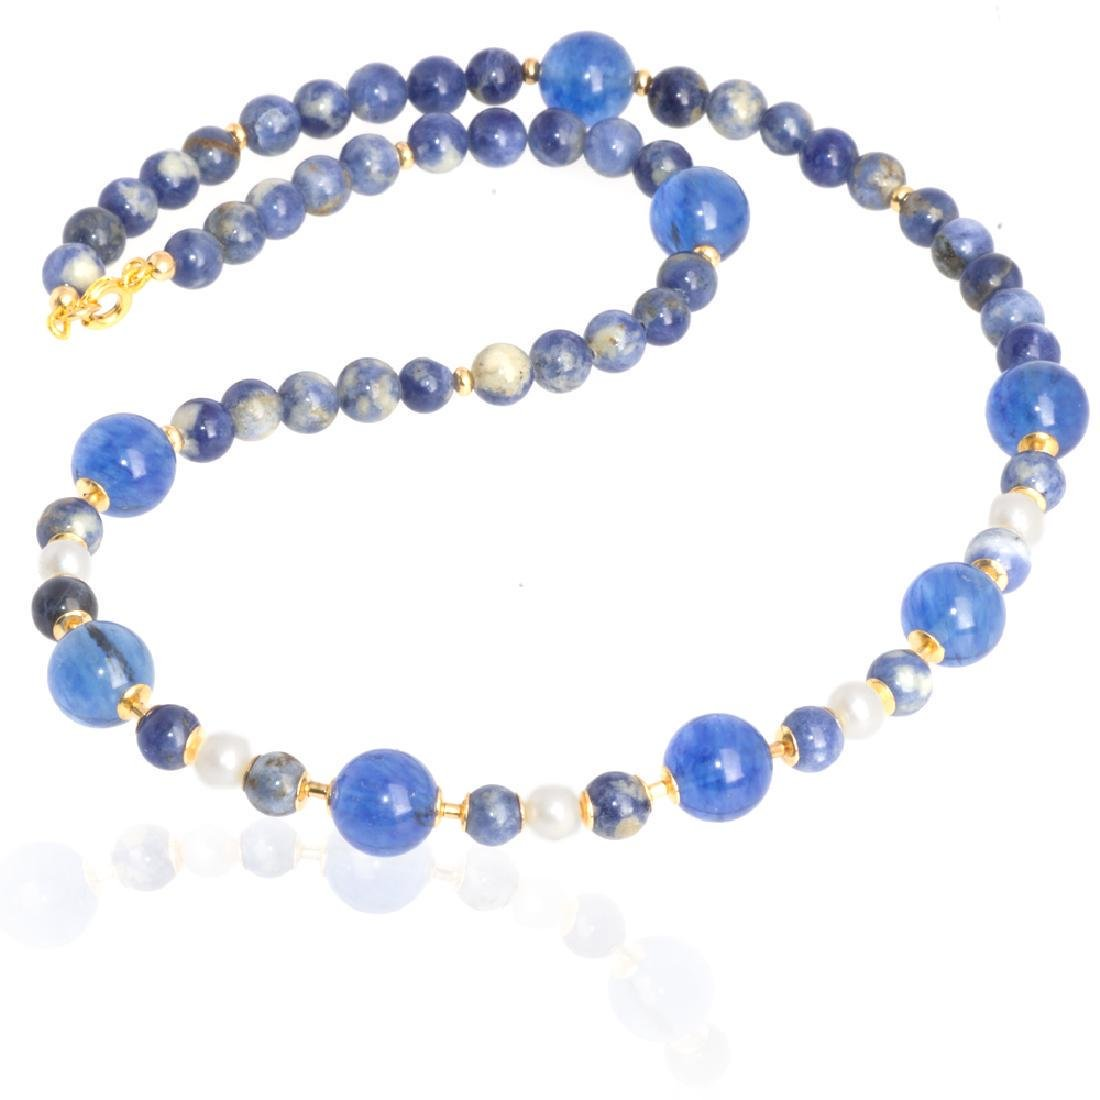 Sodalite and Capri quartz necklace with Pearls - 3